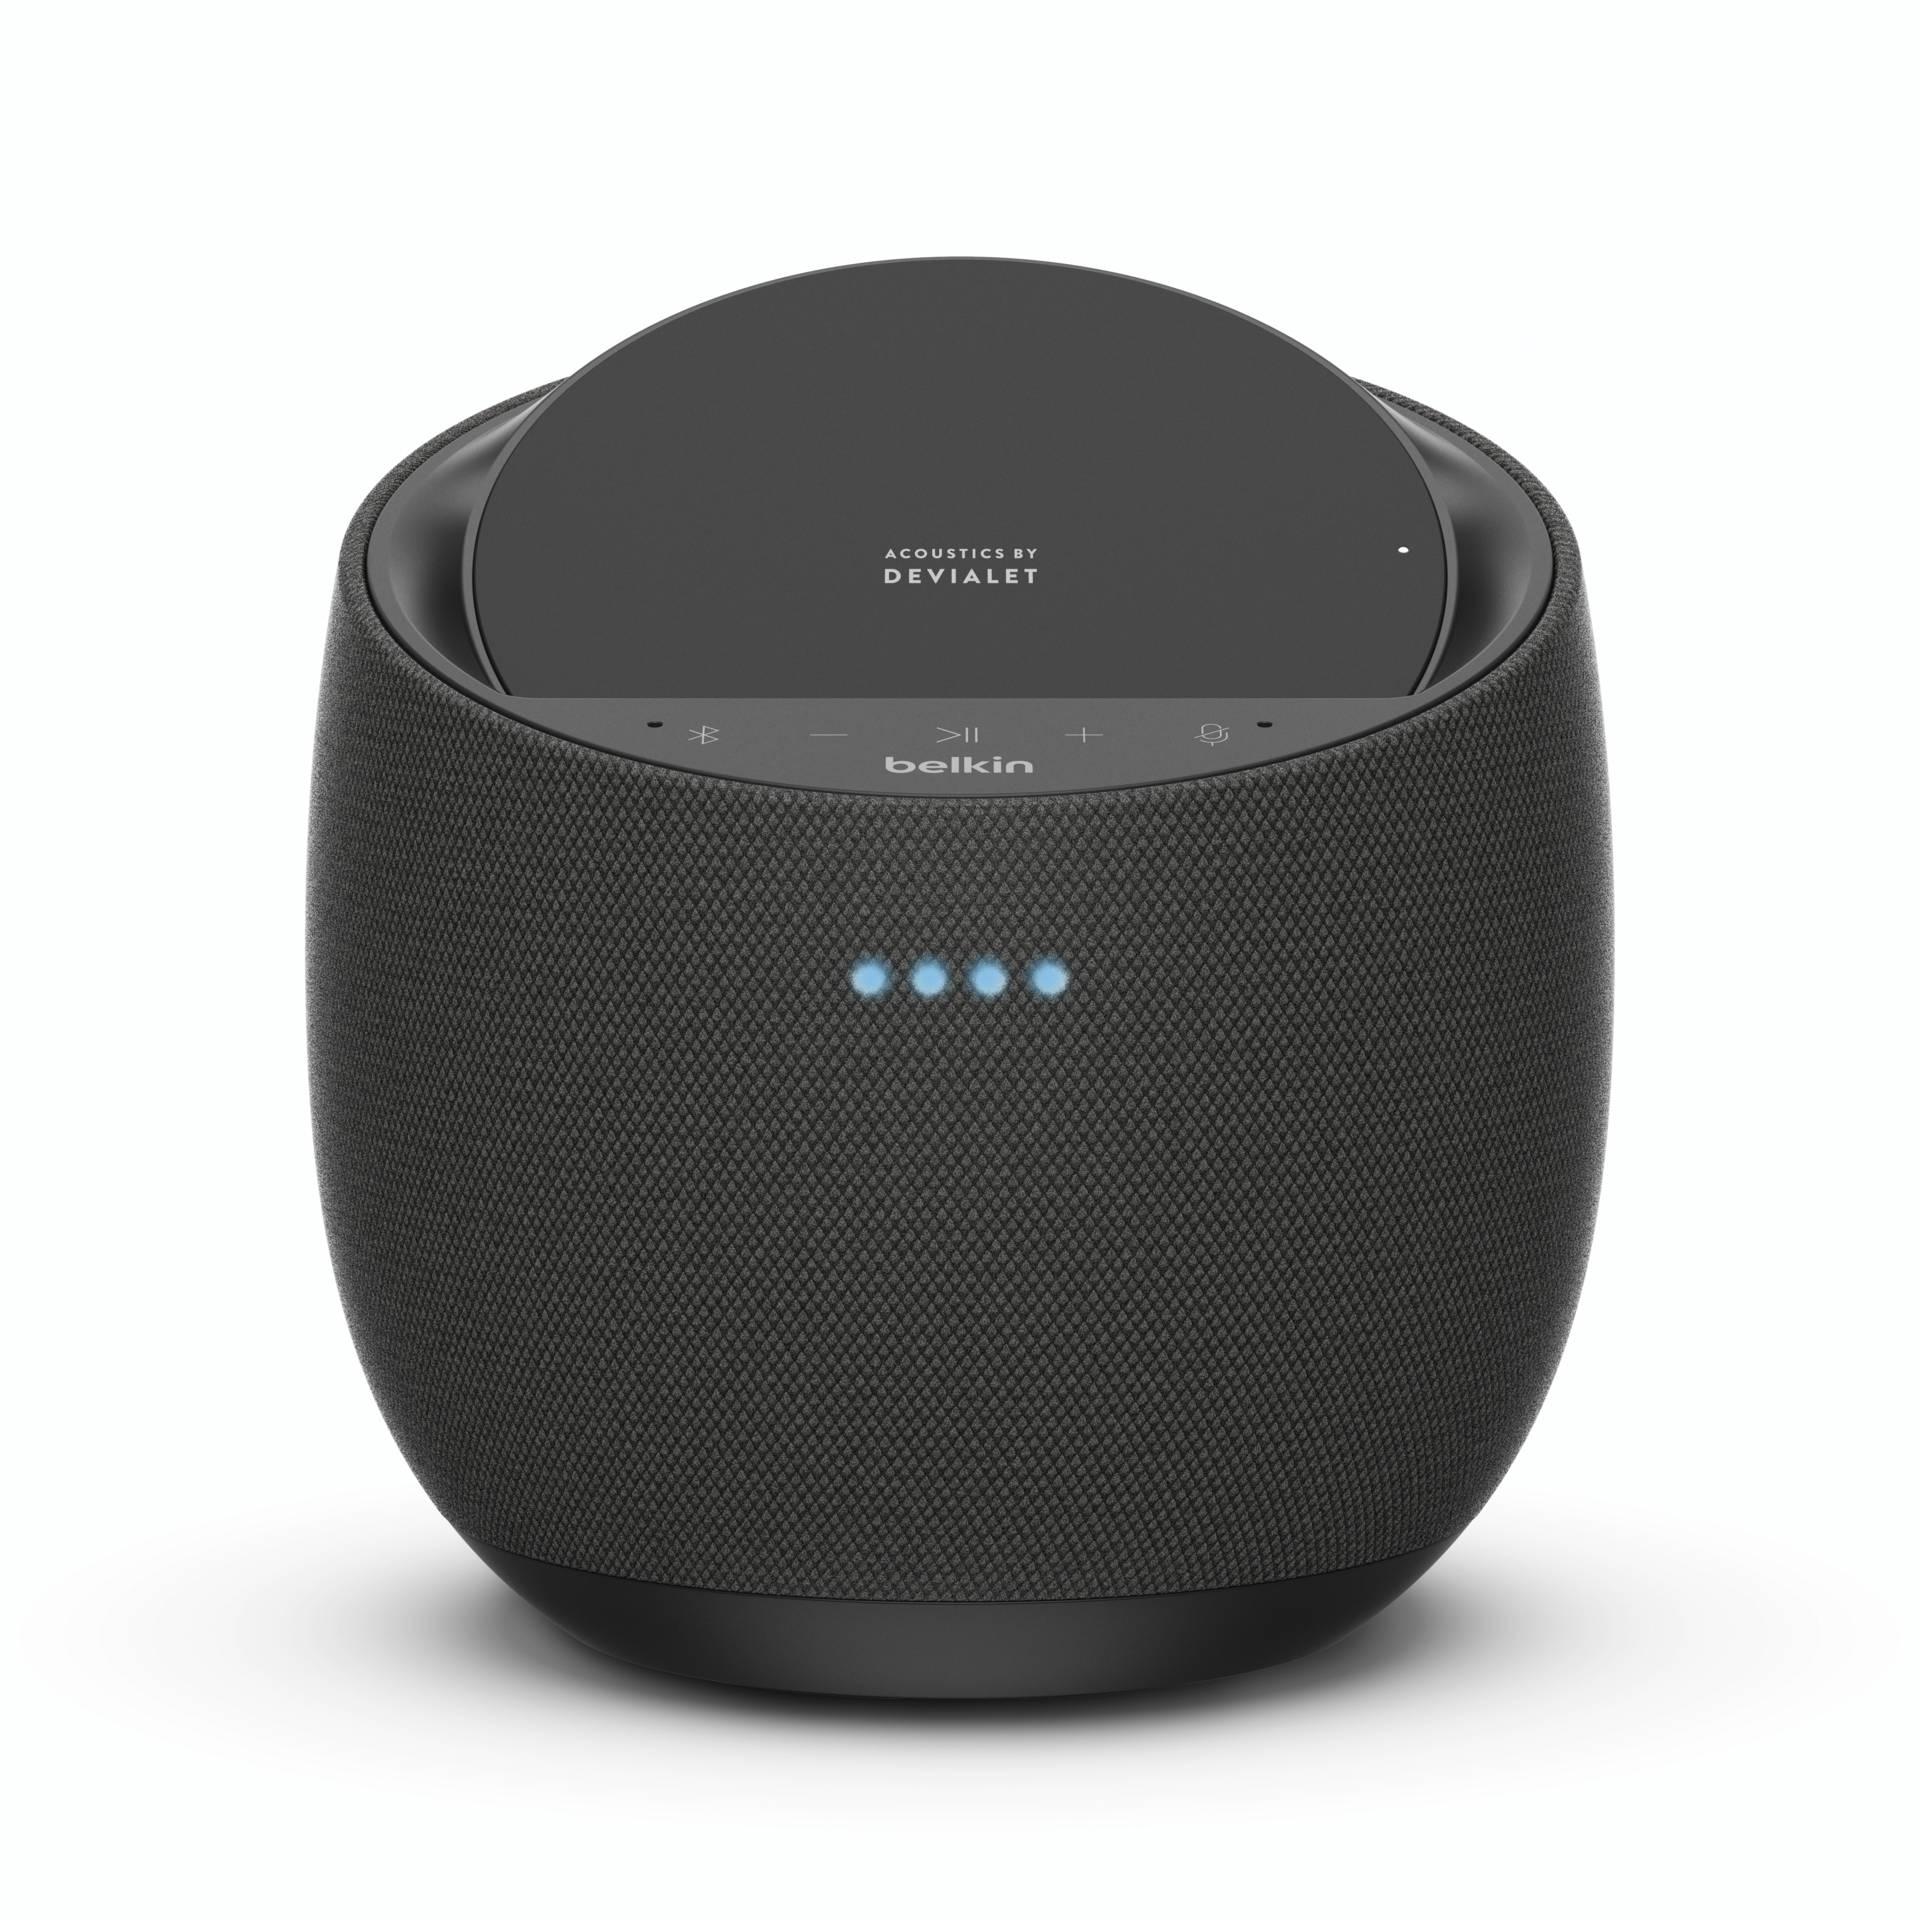 Belkin Soundform Elite Hi-Fi Smart Speaker with Alexa G1S0002vf- black